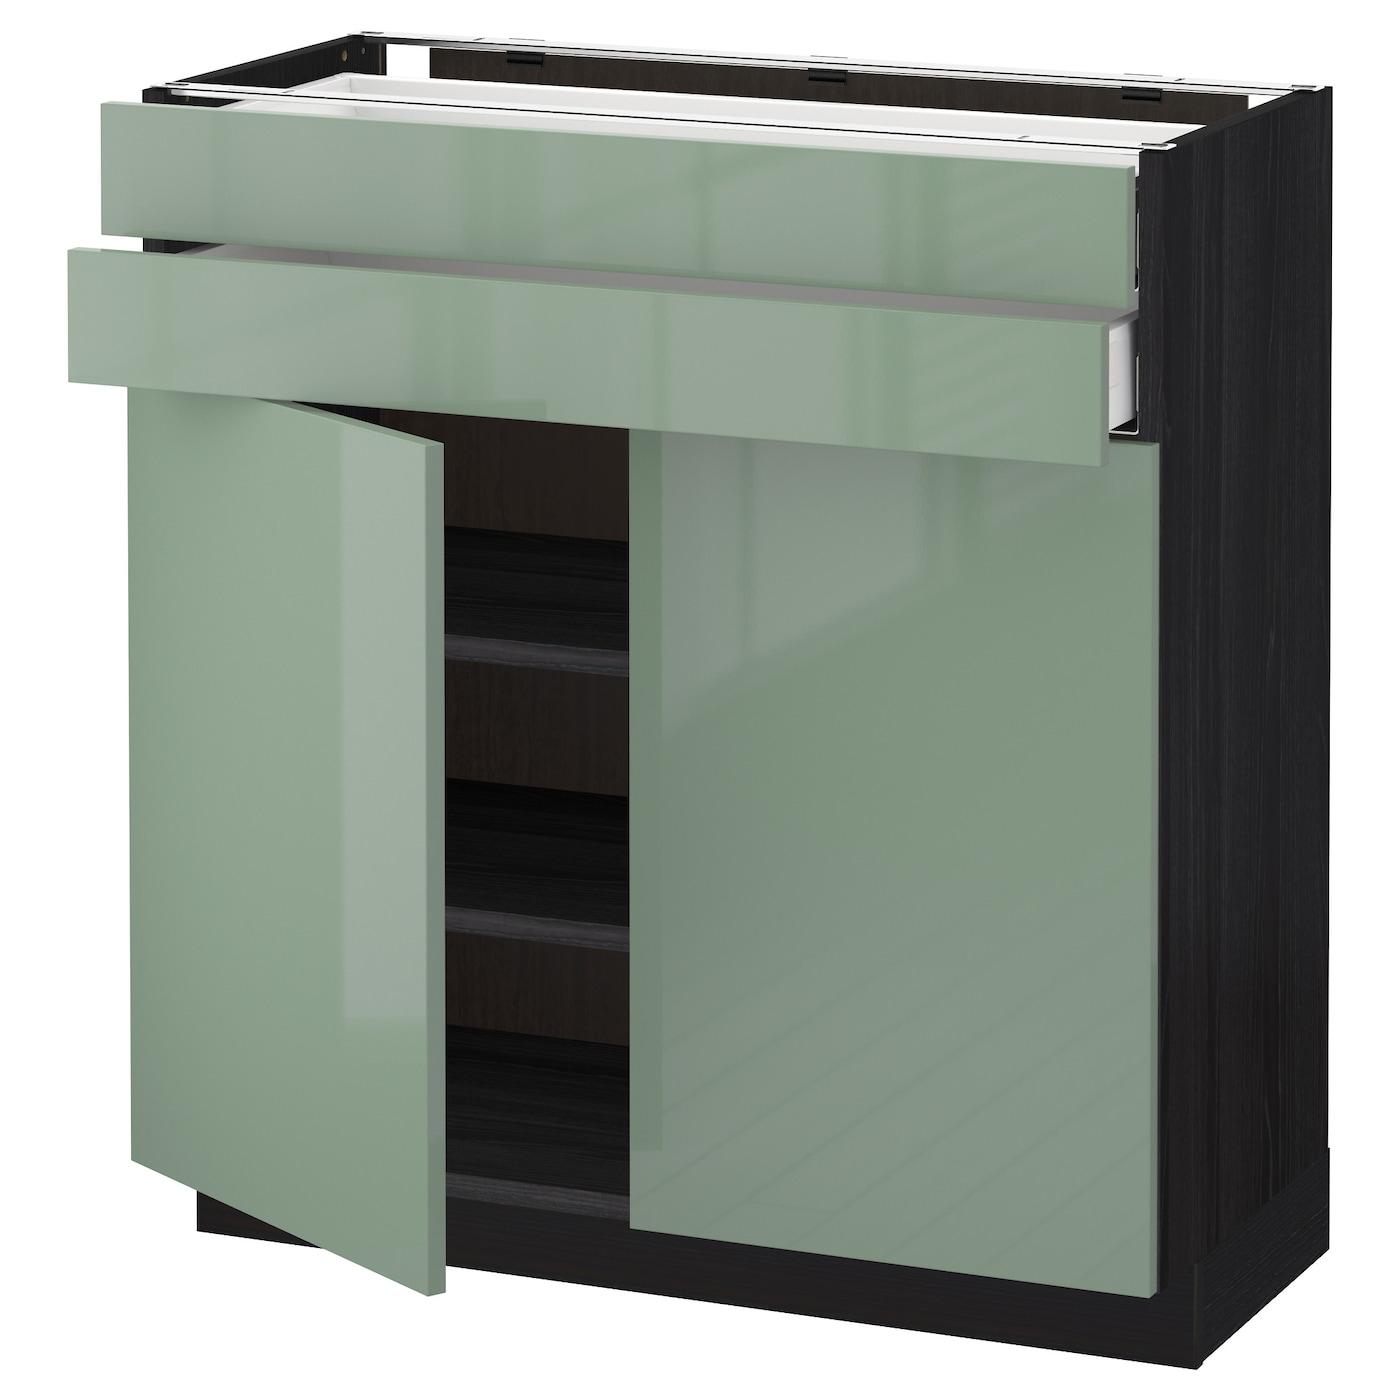 Ikea Green Kitchen Cabinets: METOD/MAXIMERA Base Cabinet W 2 Doors/2 Drawers Black